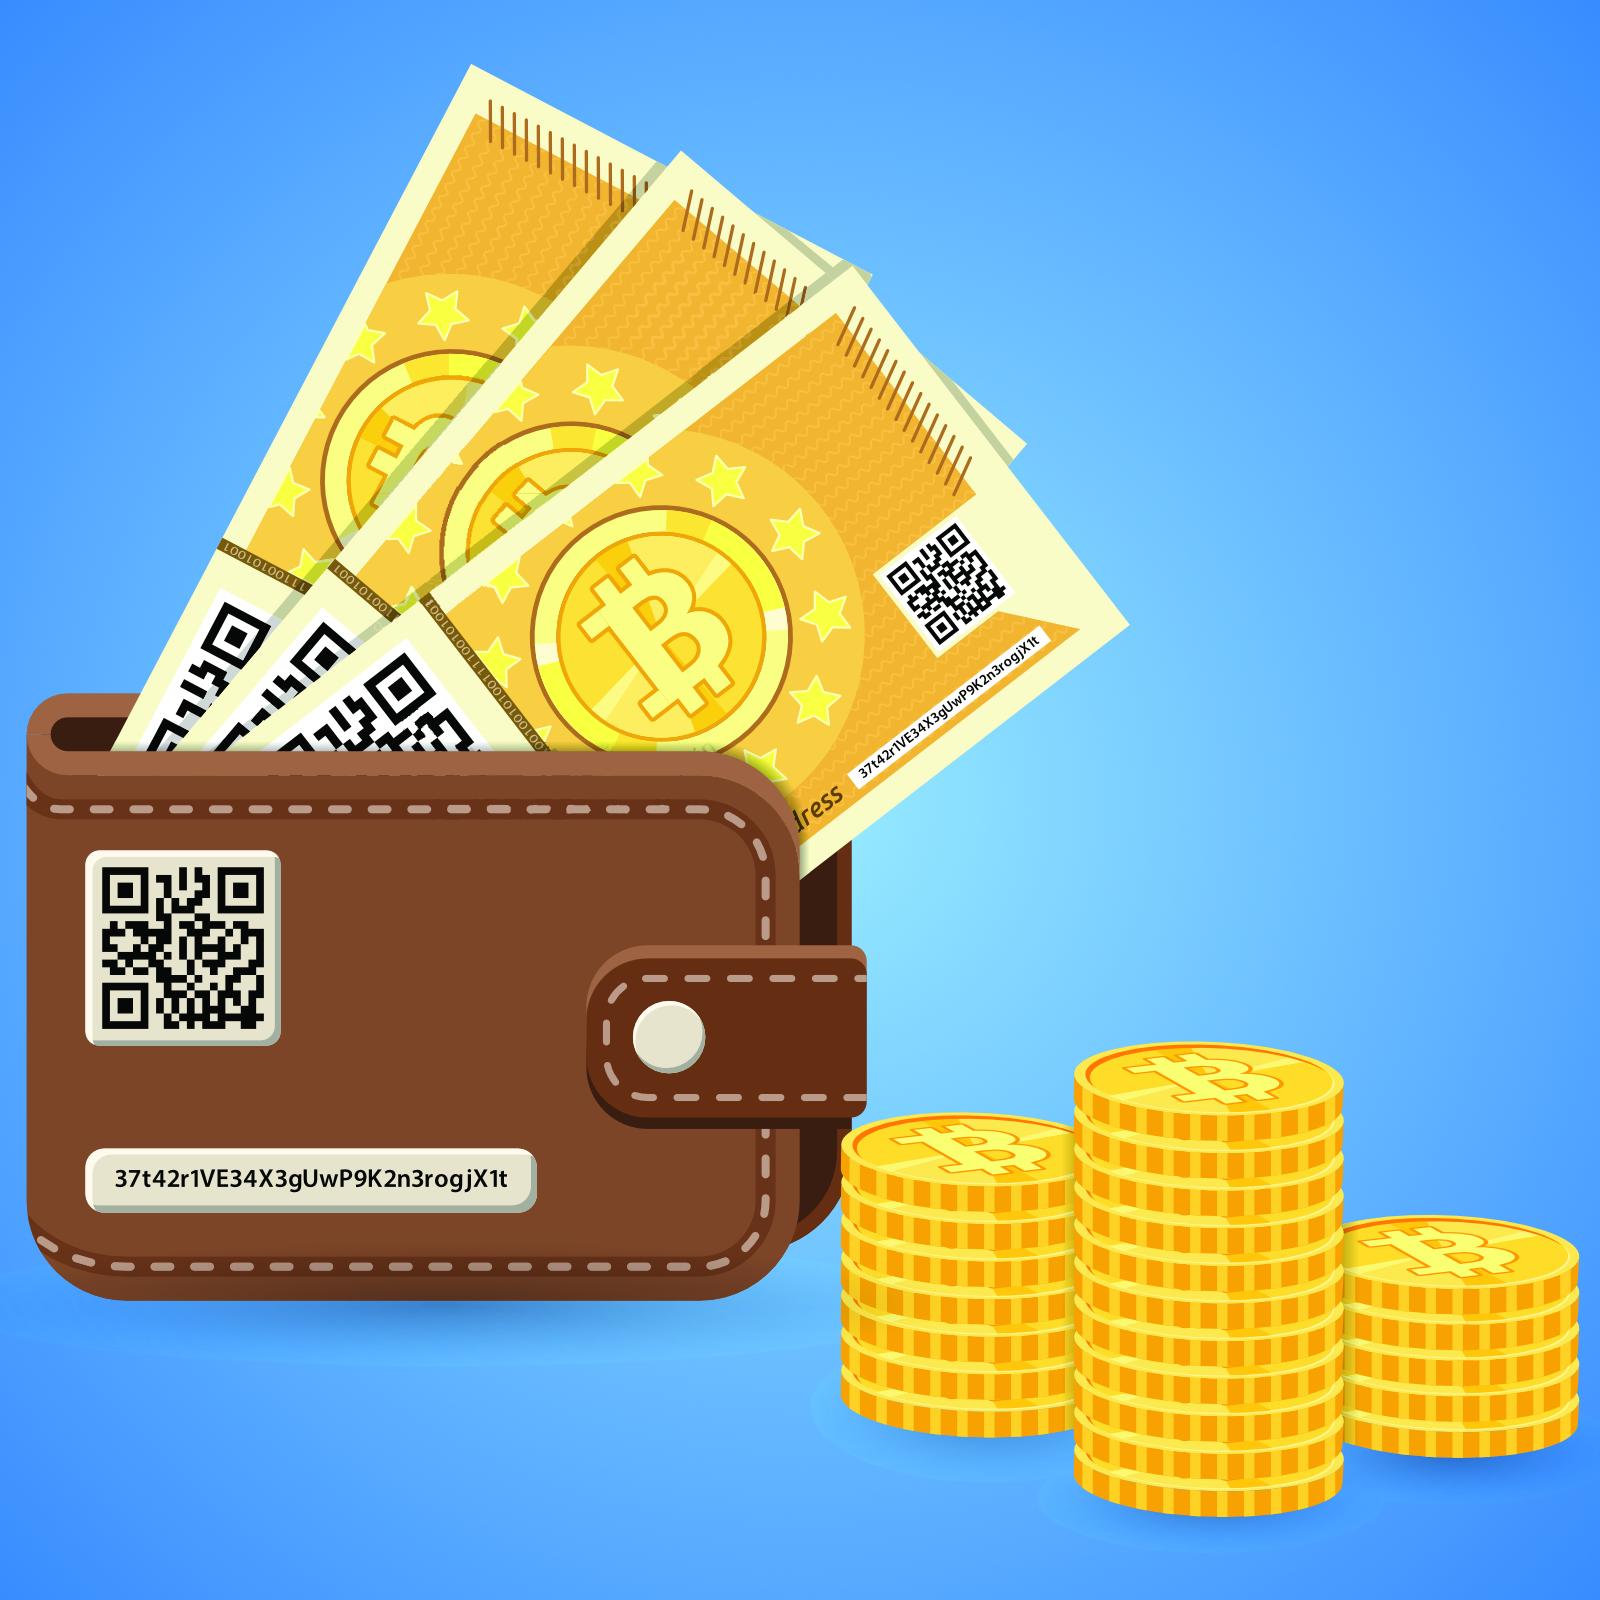 virtual cash, and afterward, bitcoin